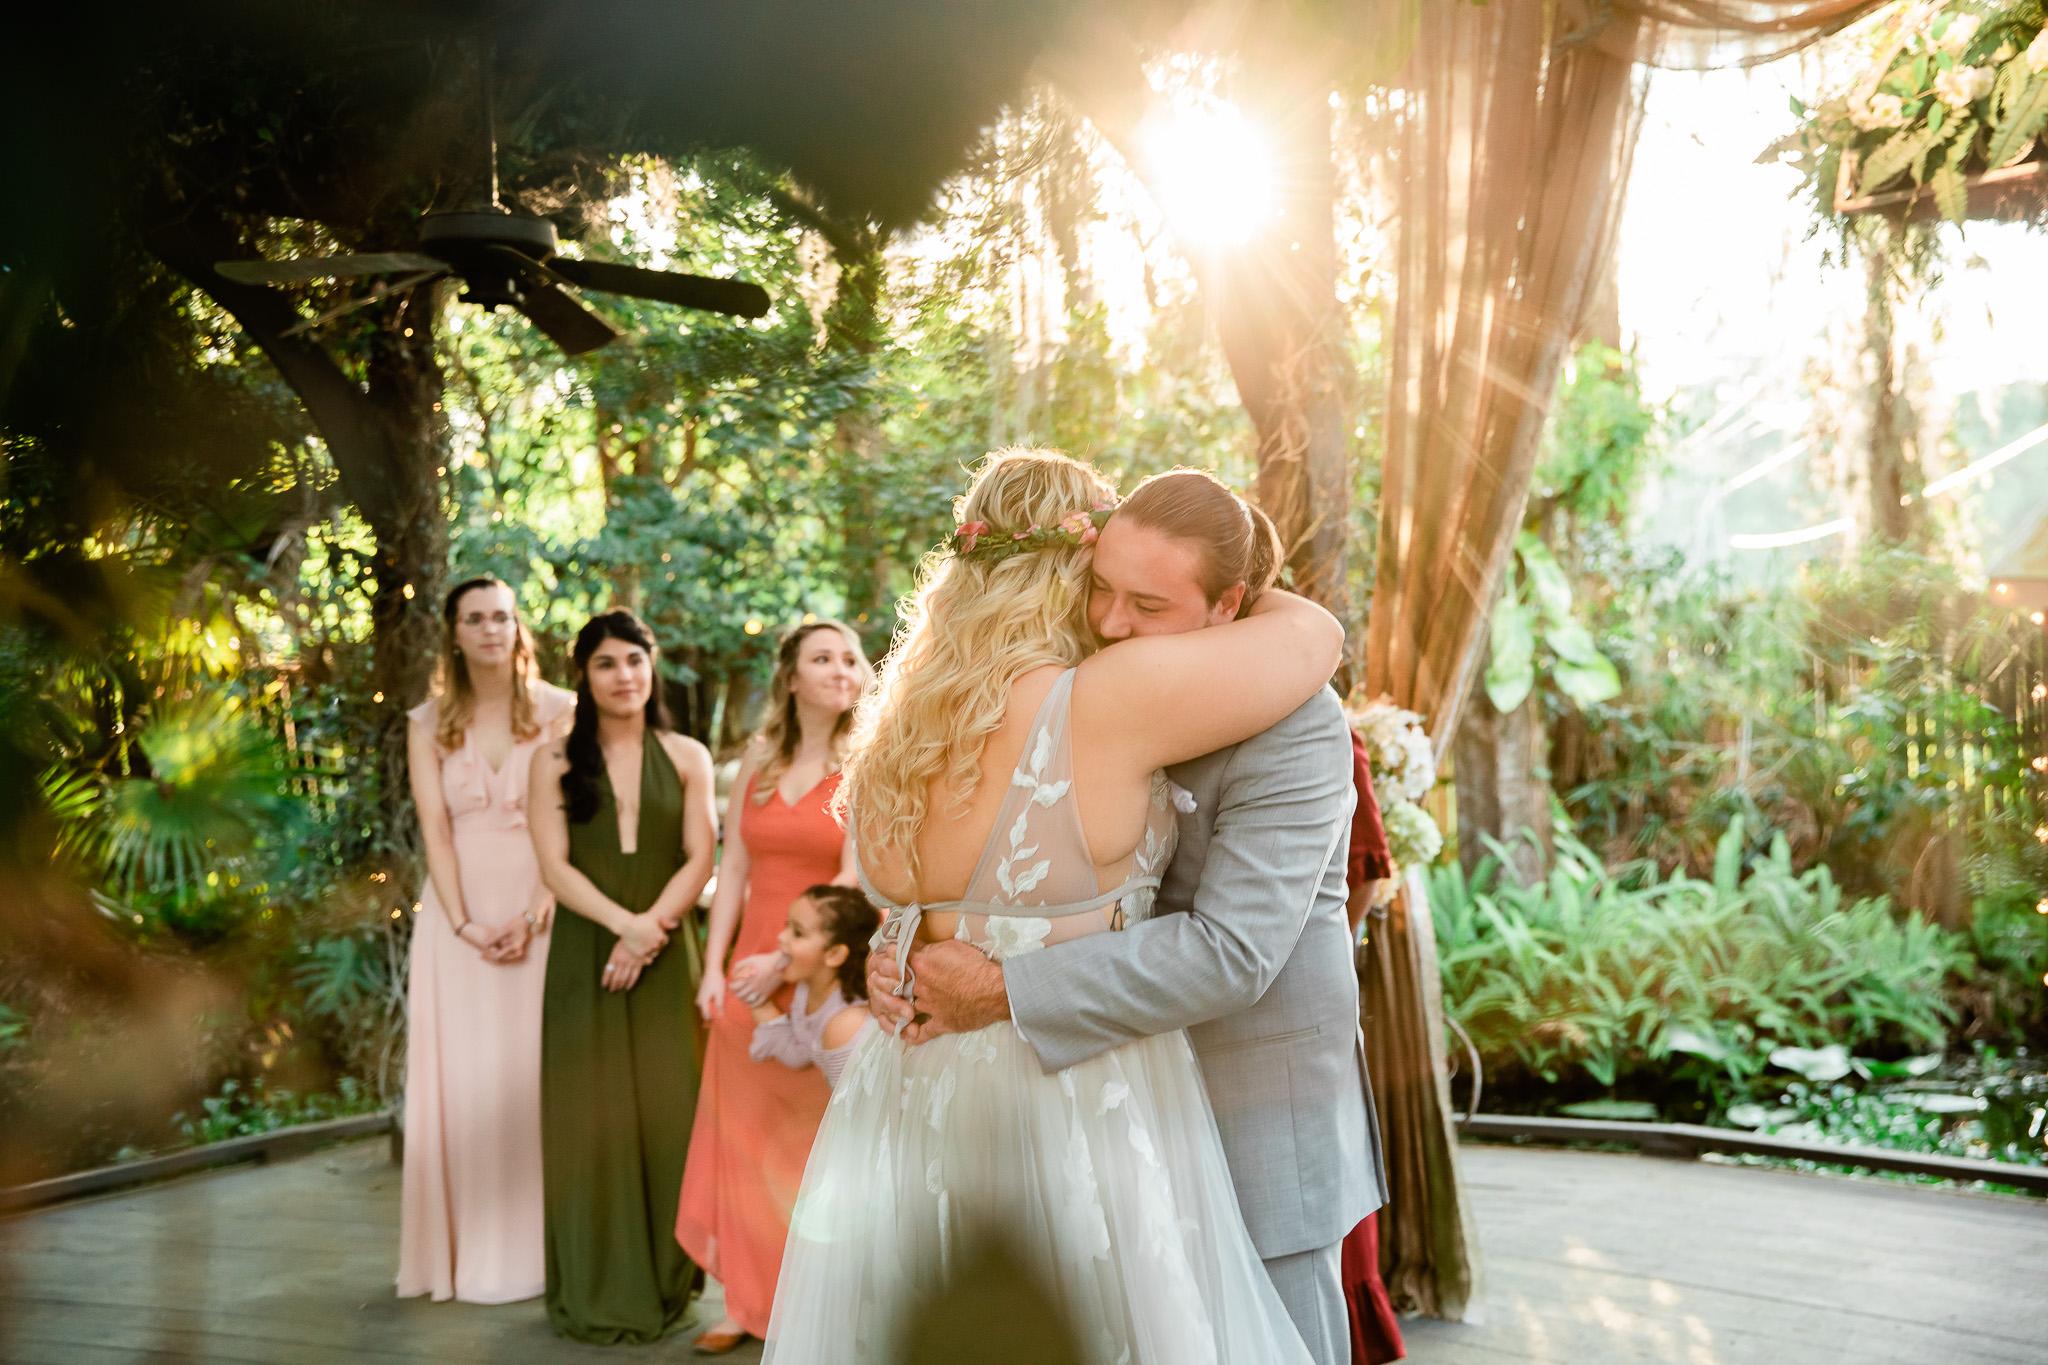 TAMPA_WEDDING_GIGIS_COUNTRY_GARDEN_CJMZ_TJP48392.jpg